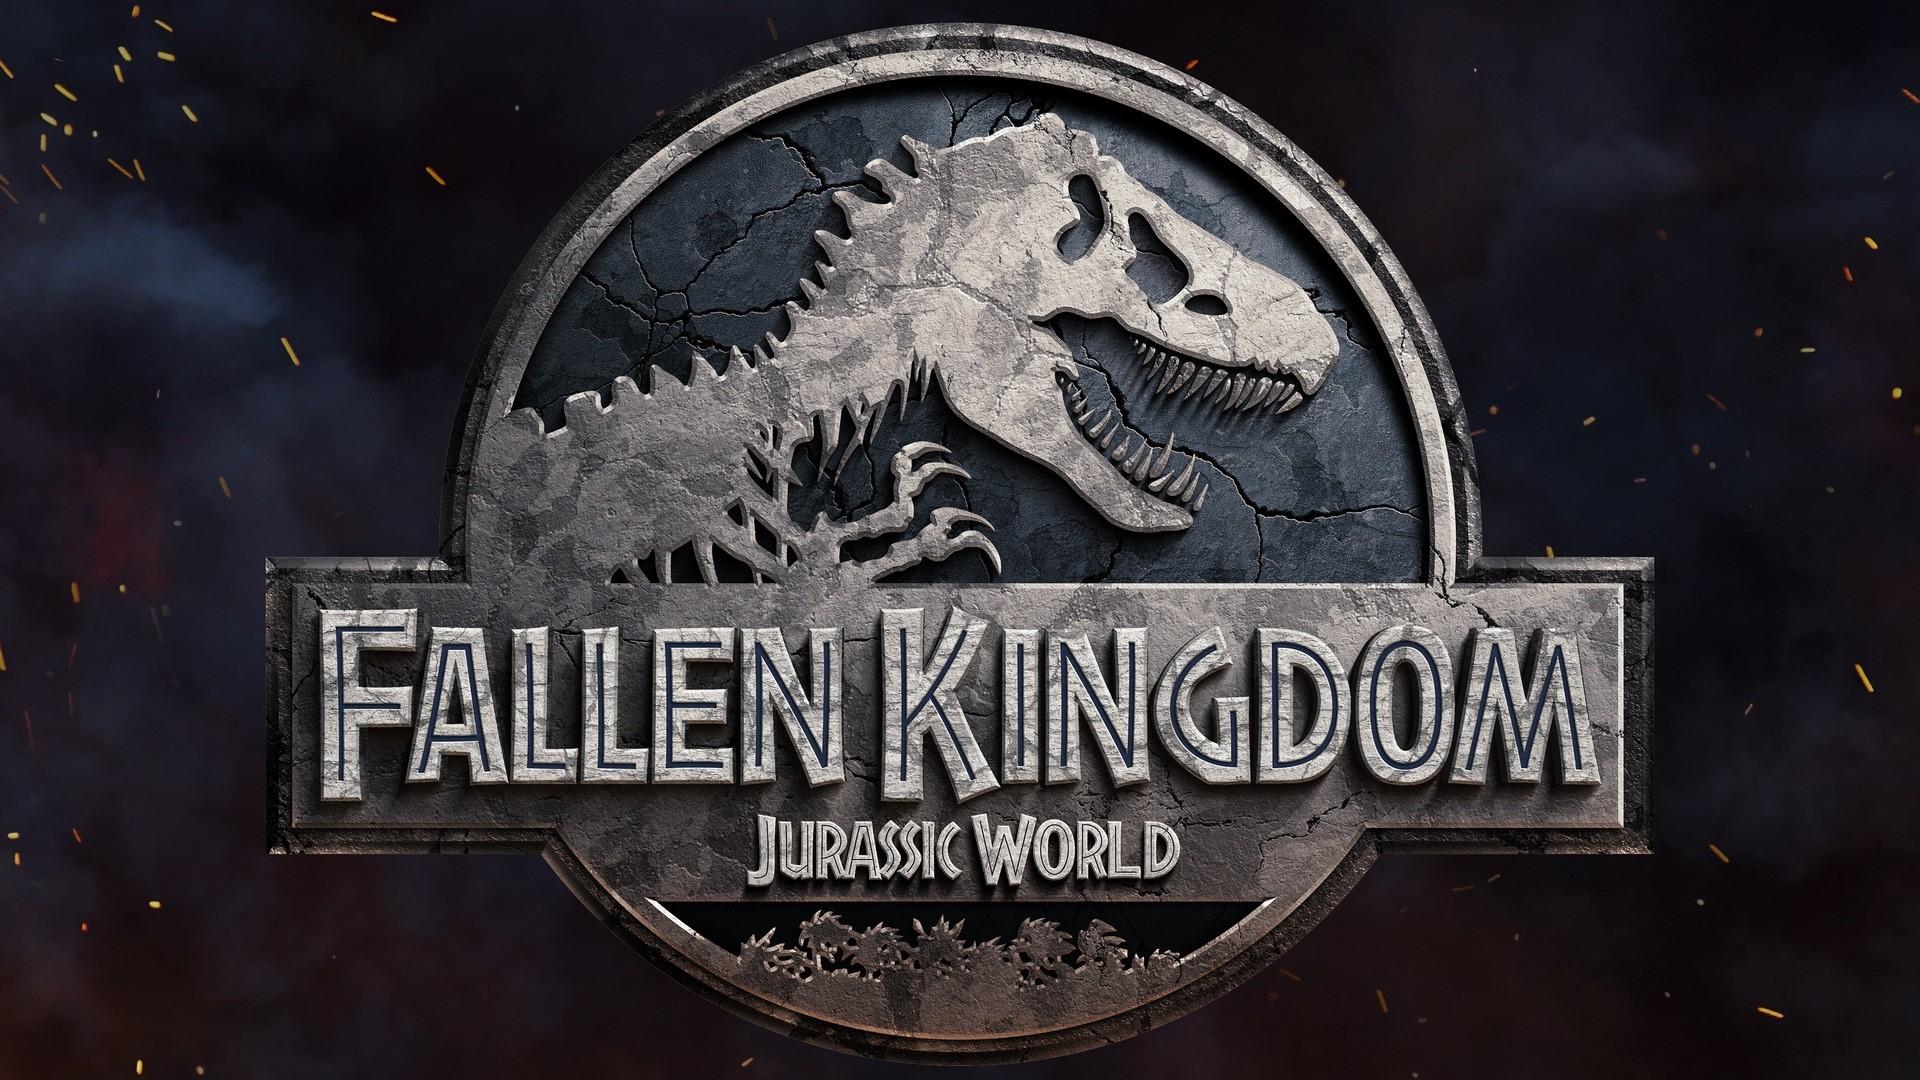 Jurassic World wallpaper photo hd